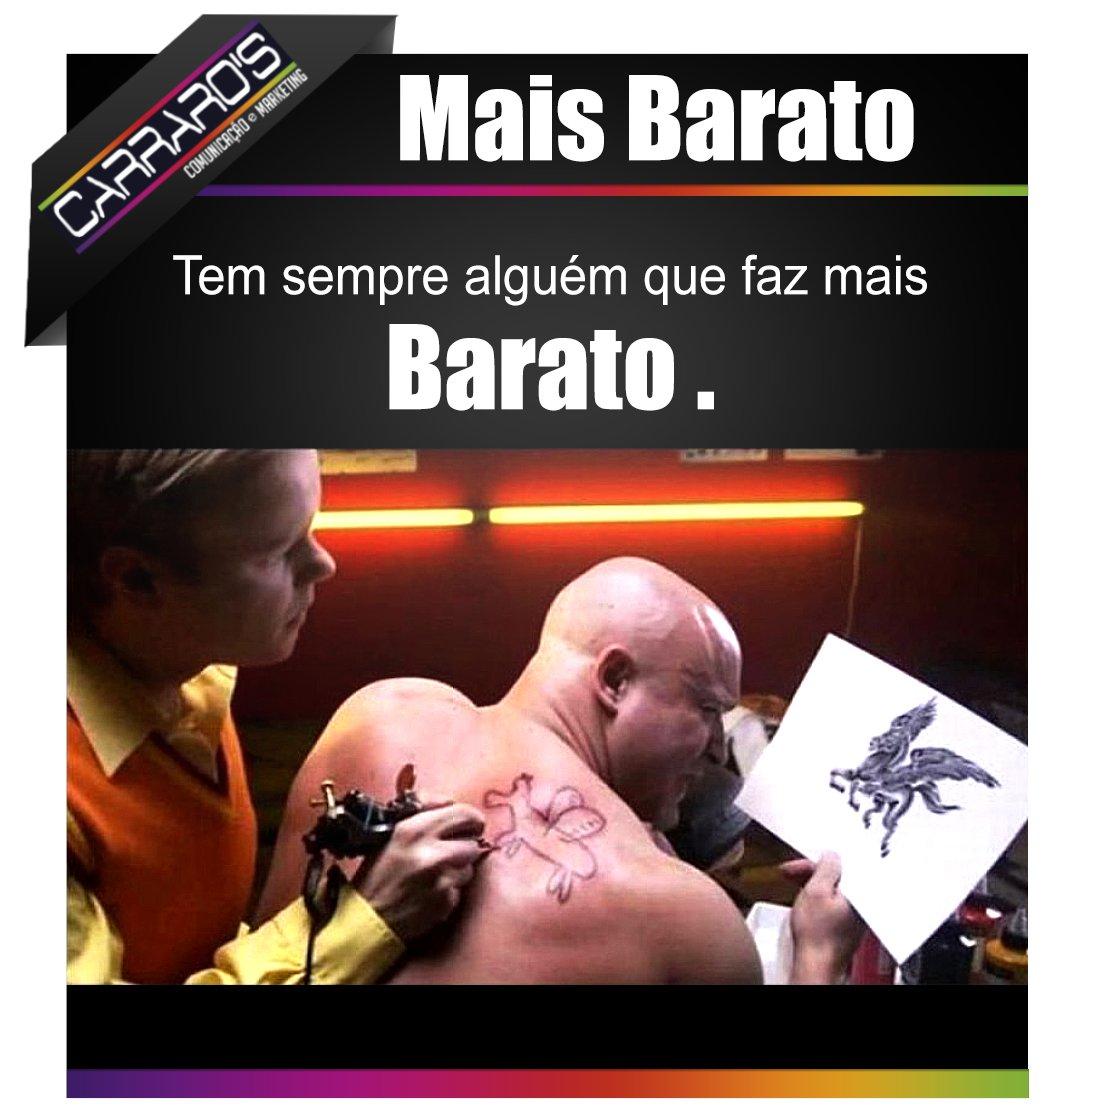 c791d3140 Carraros on Twitter: